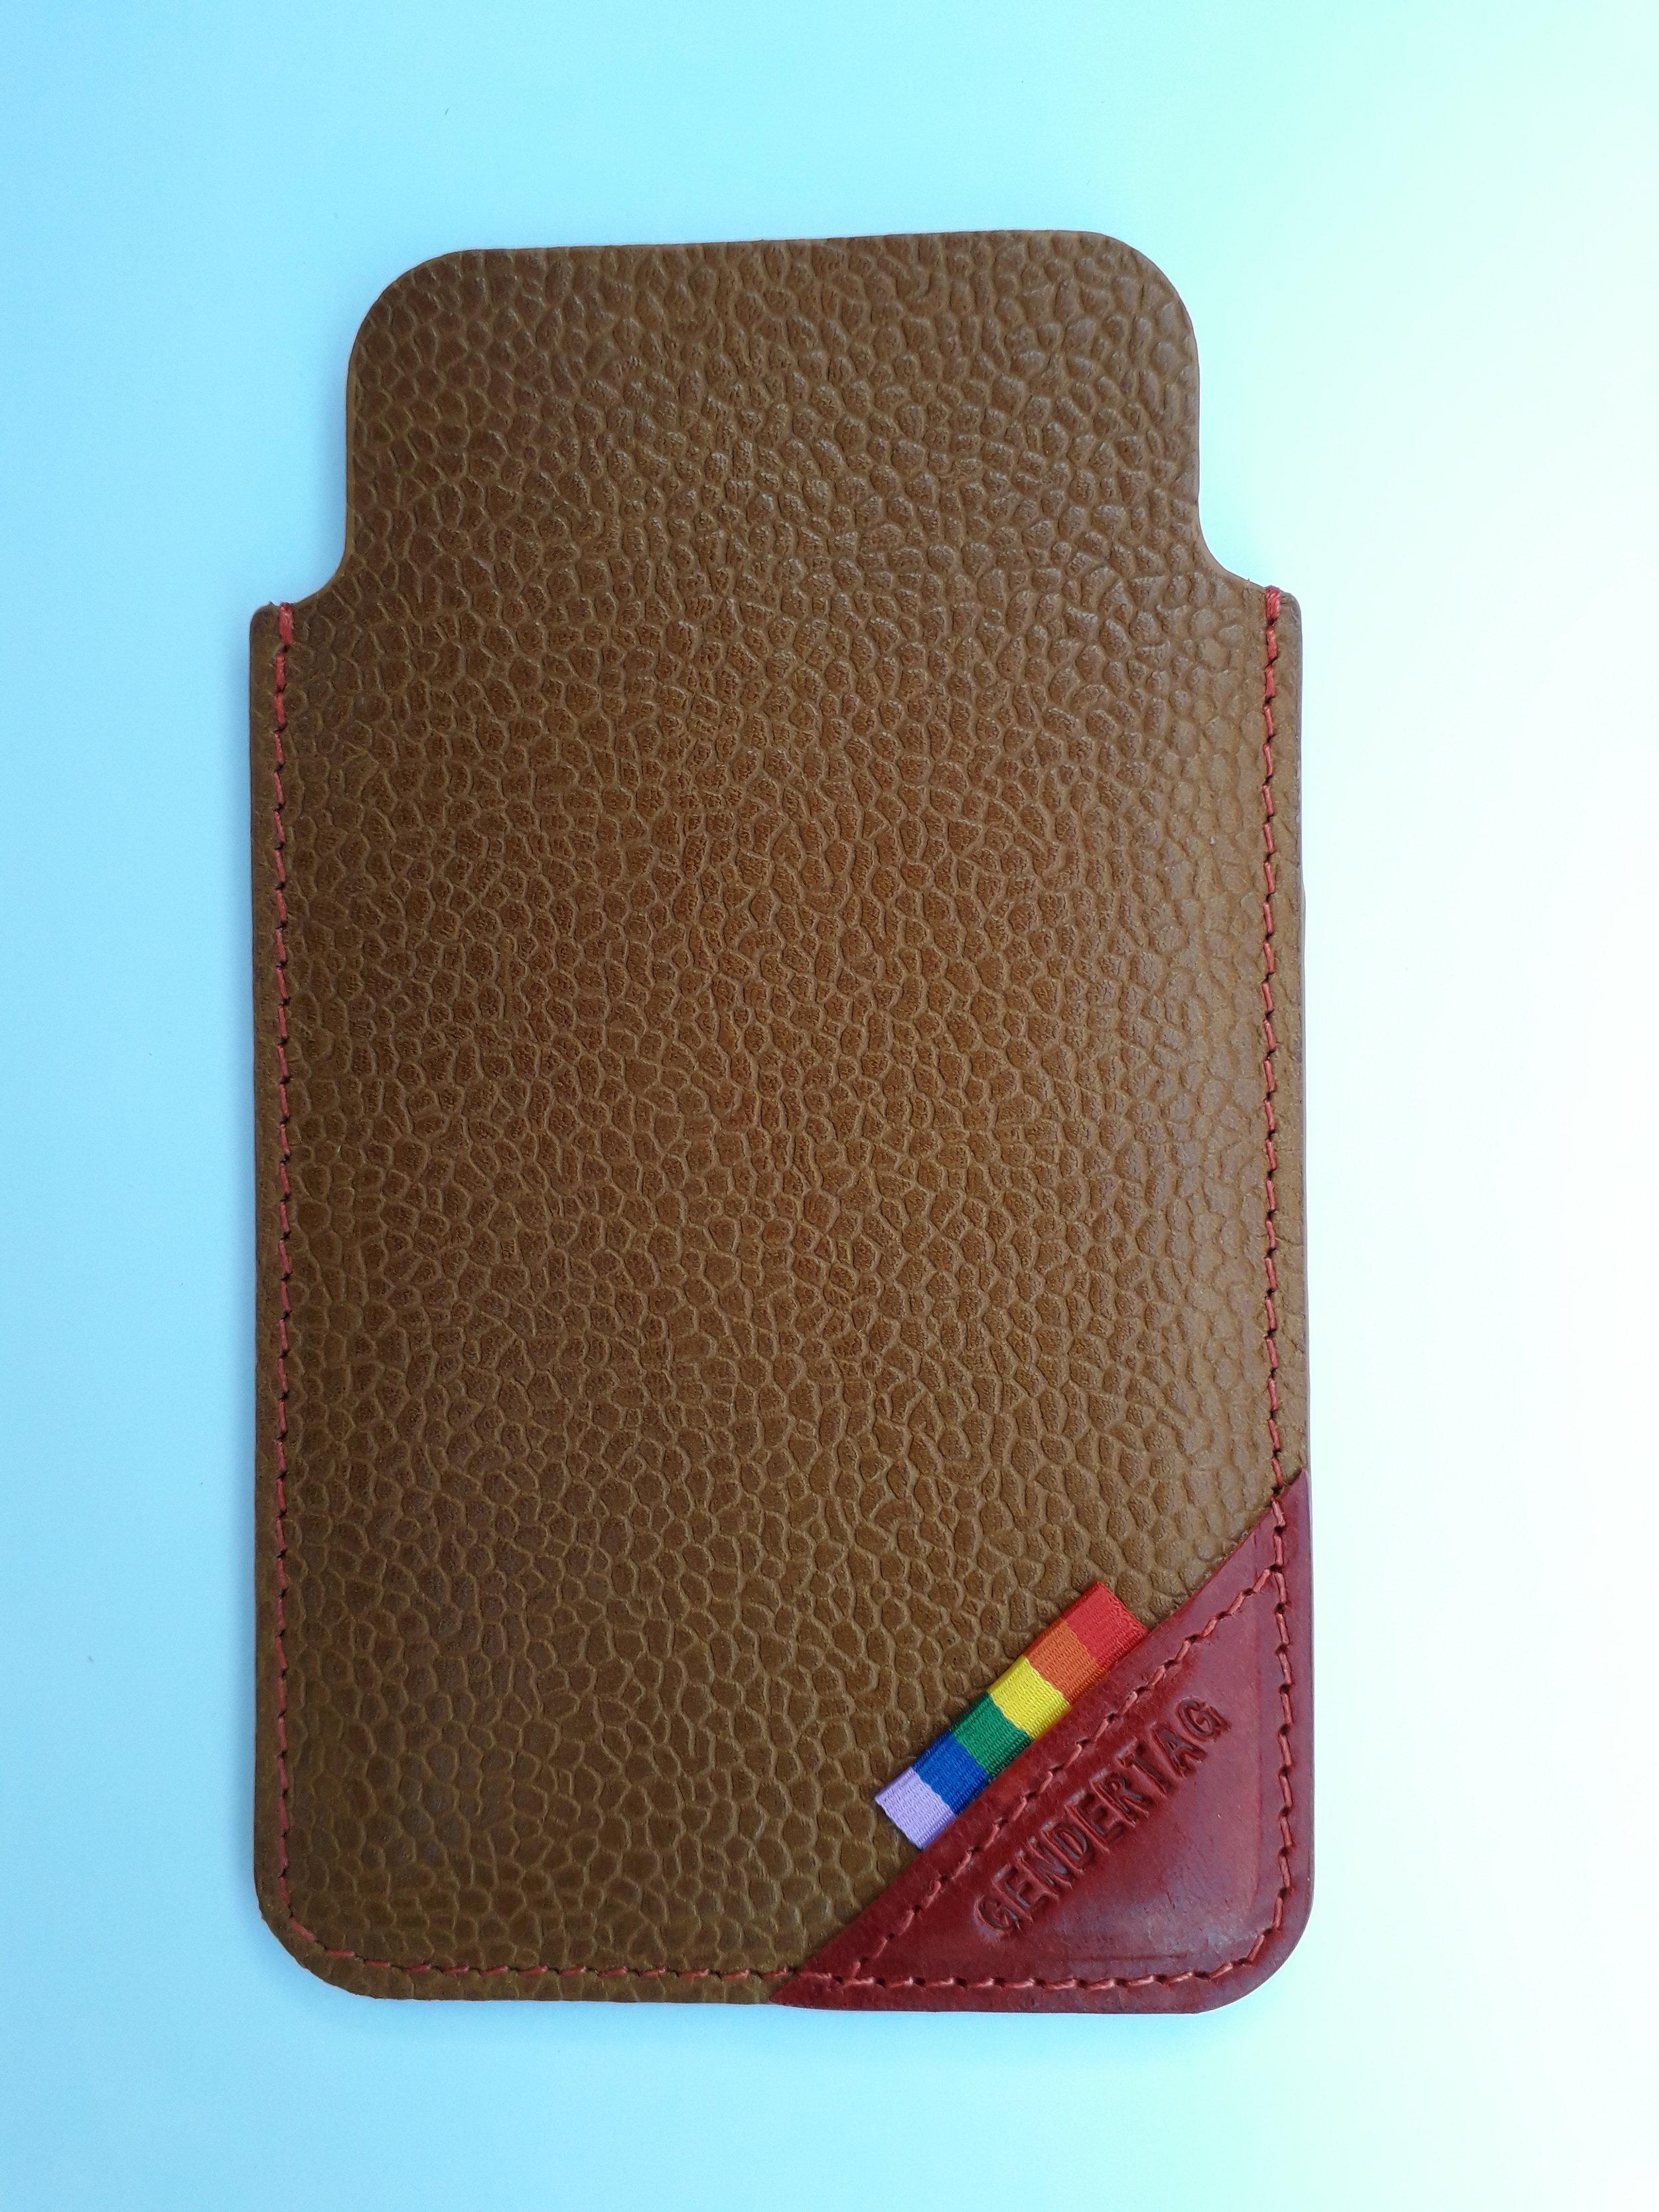 GENDERTAG Pride Leather Phone Cases